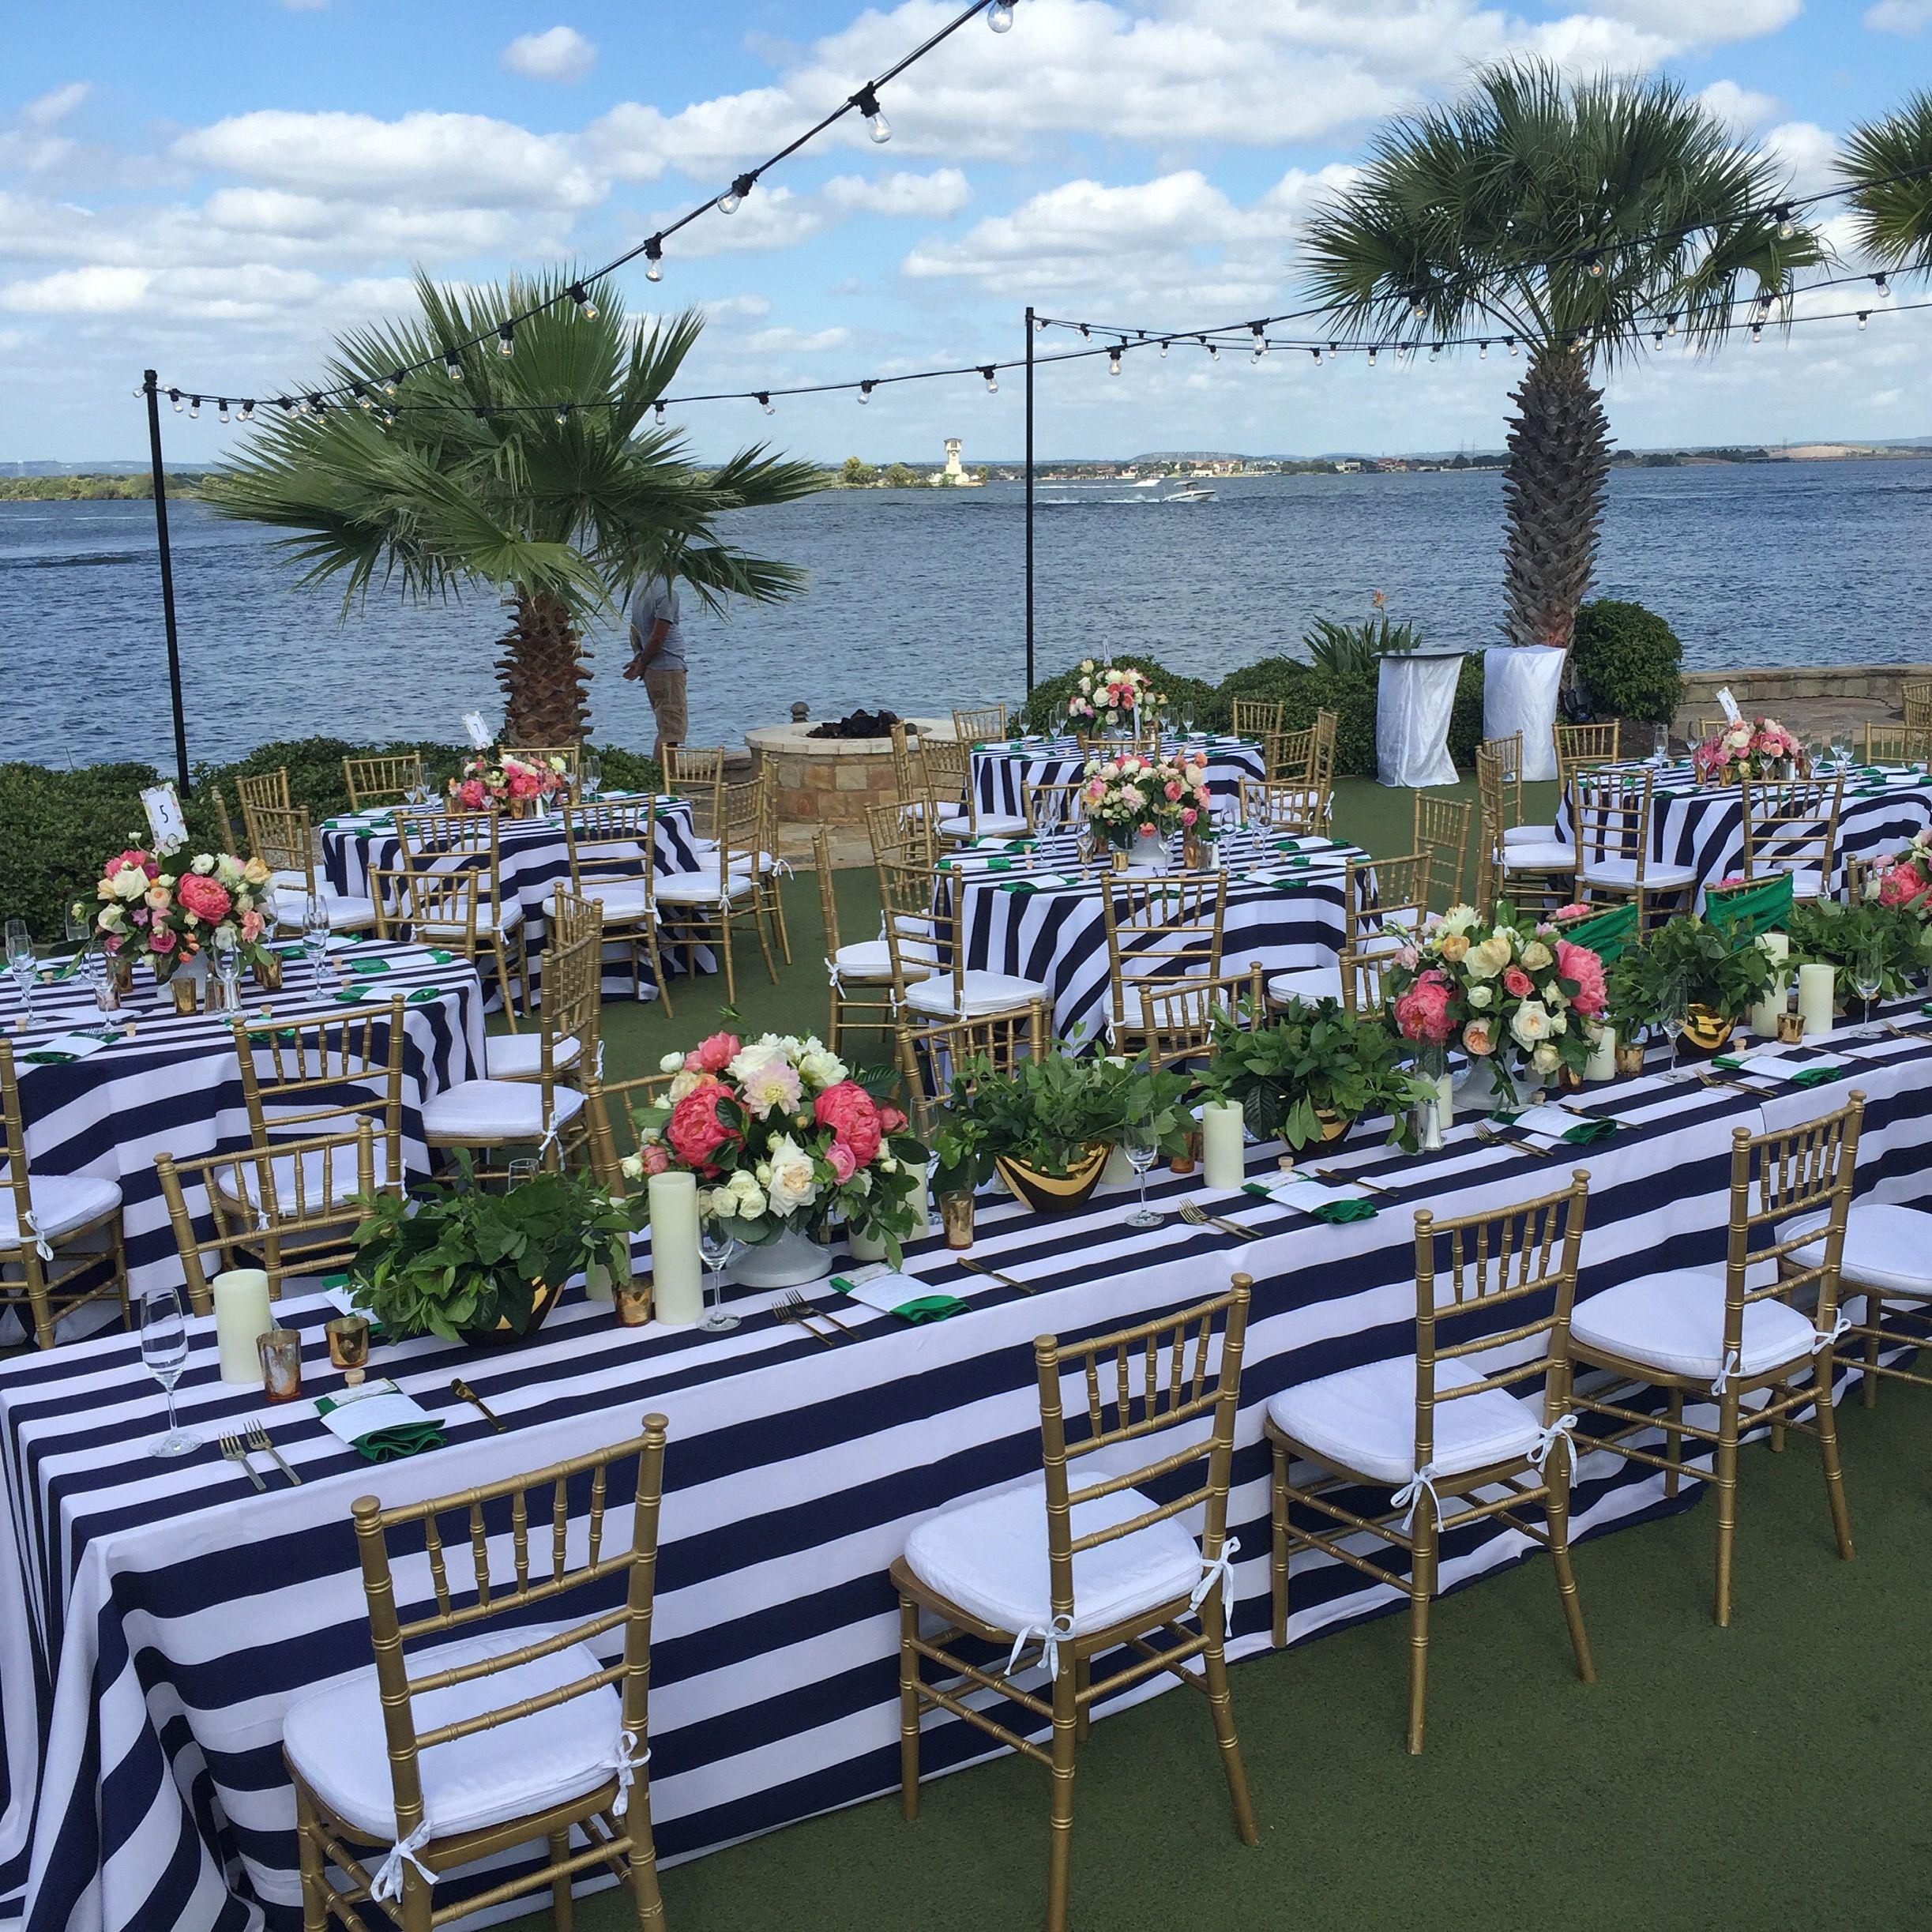 Aster lawn horseshoe bay resort resort wedding resort